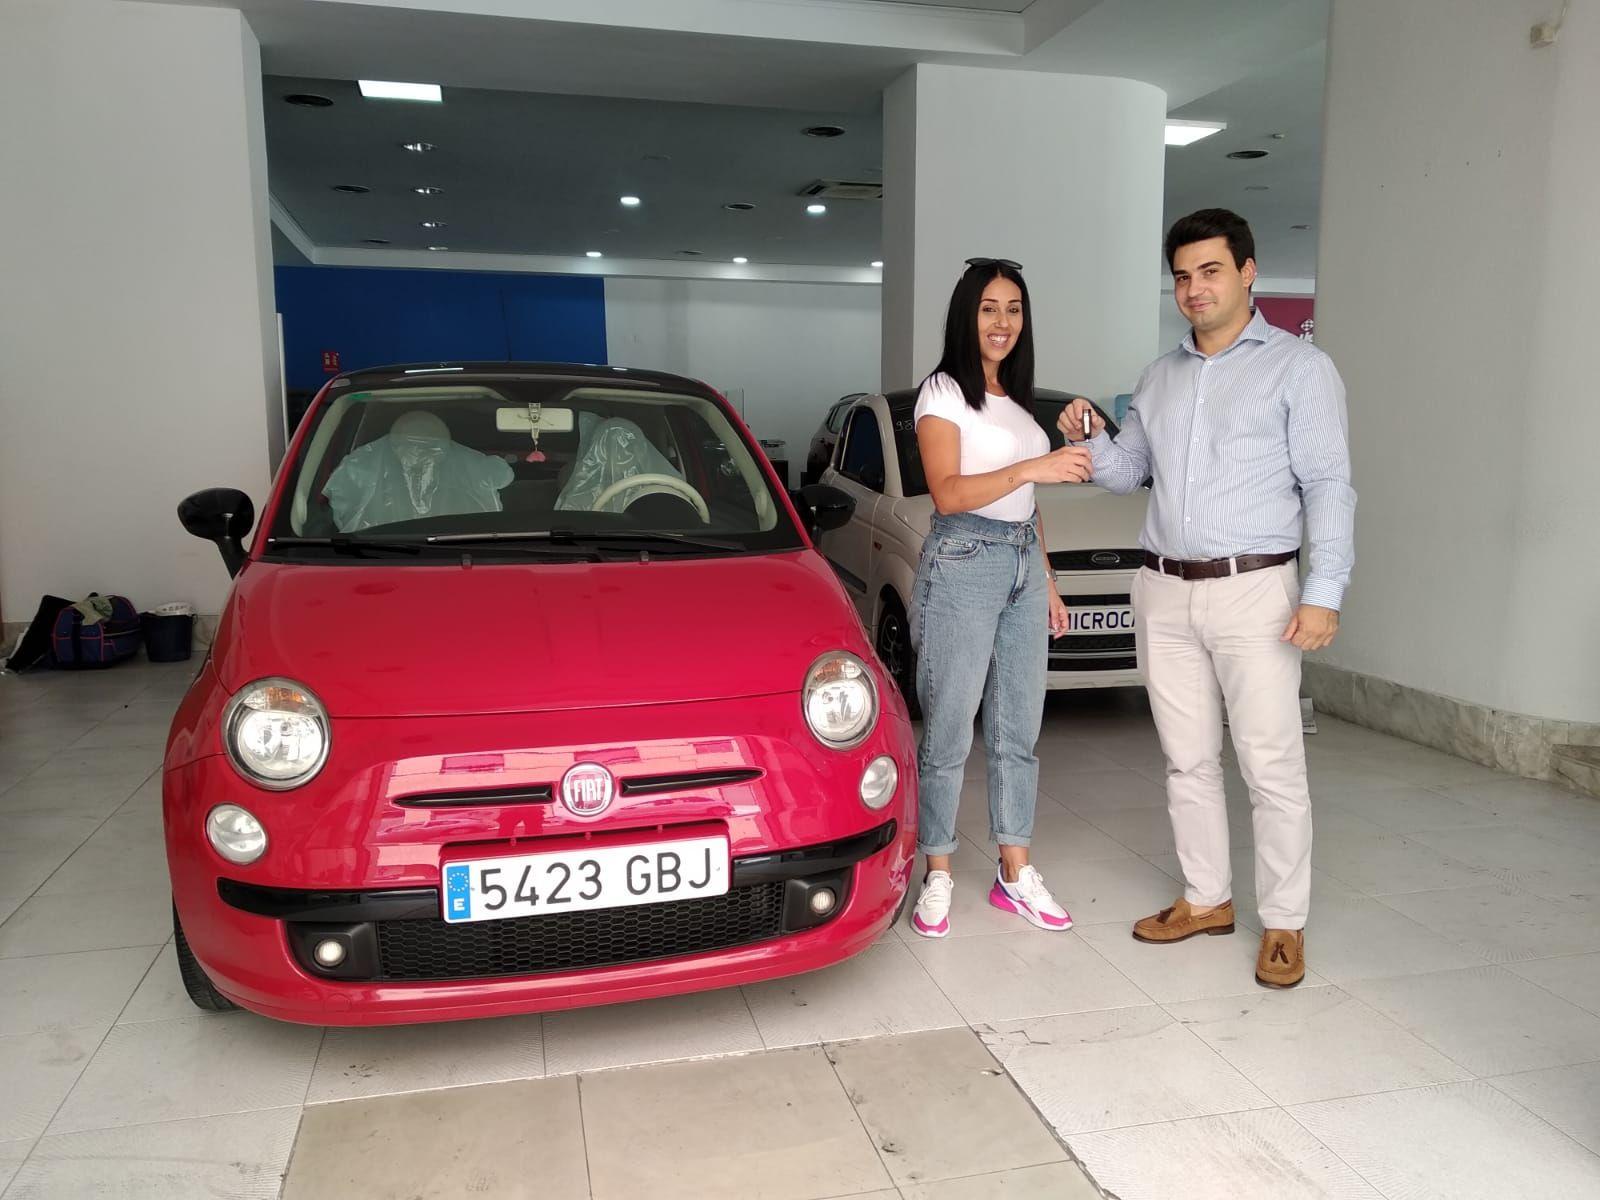 Milautomóviles entrega a Rebeca un Fiat 500